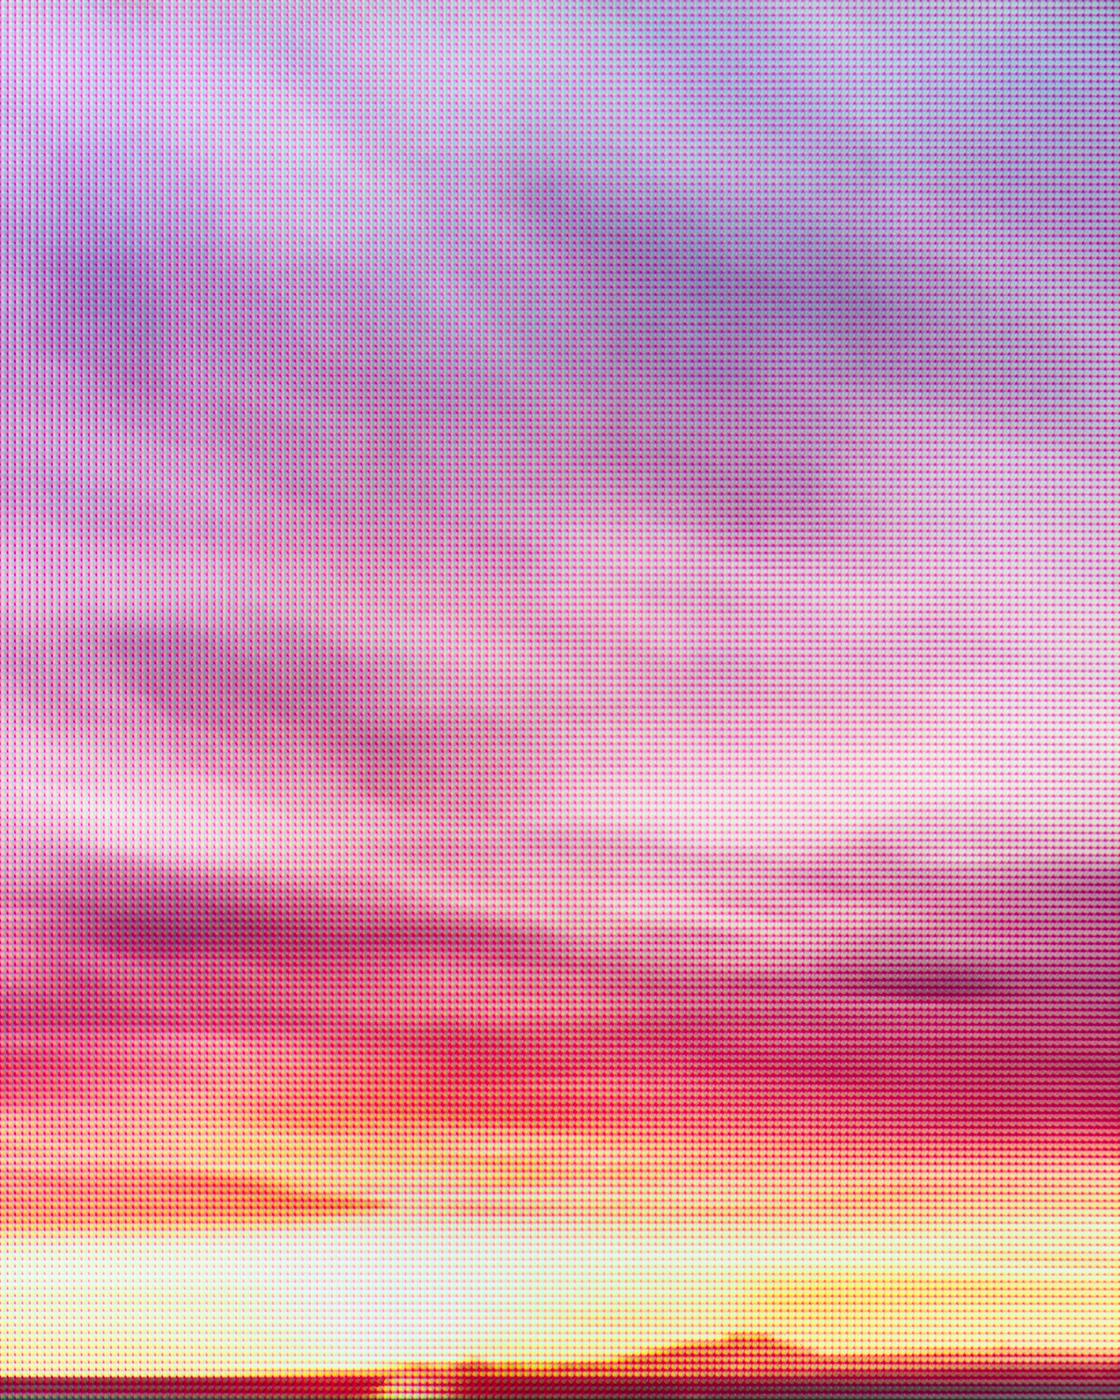 sg_sunset_44.jpg